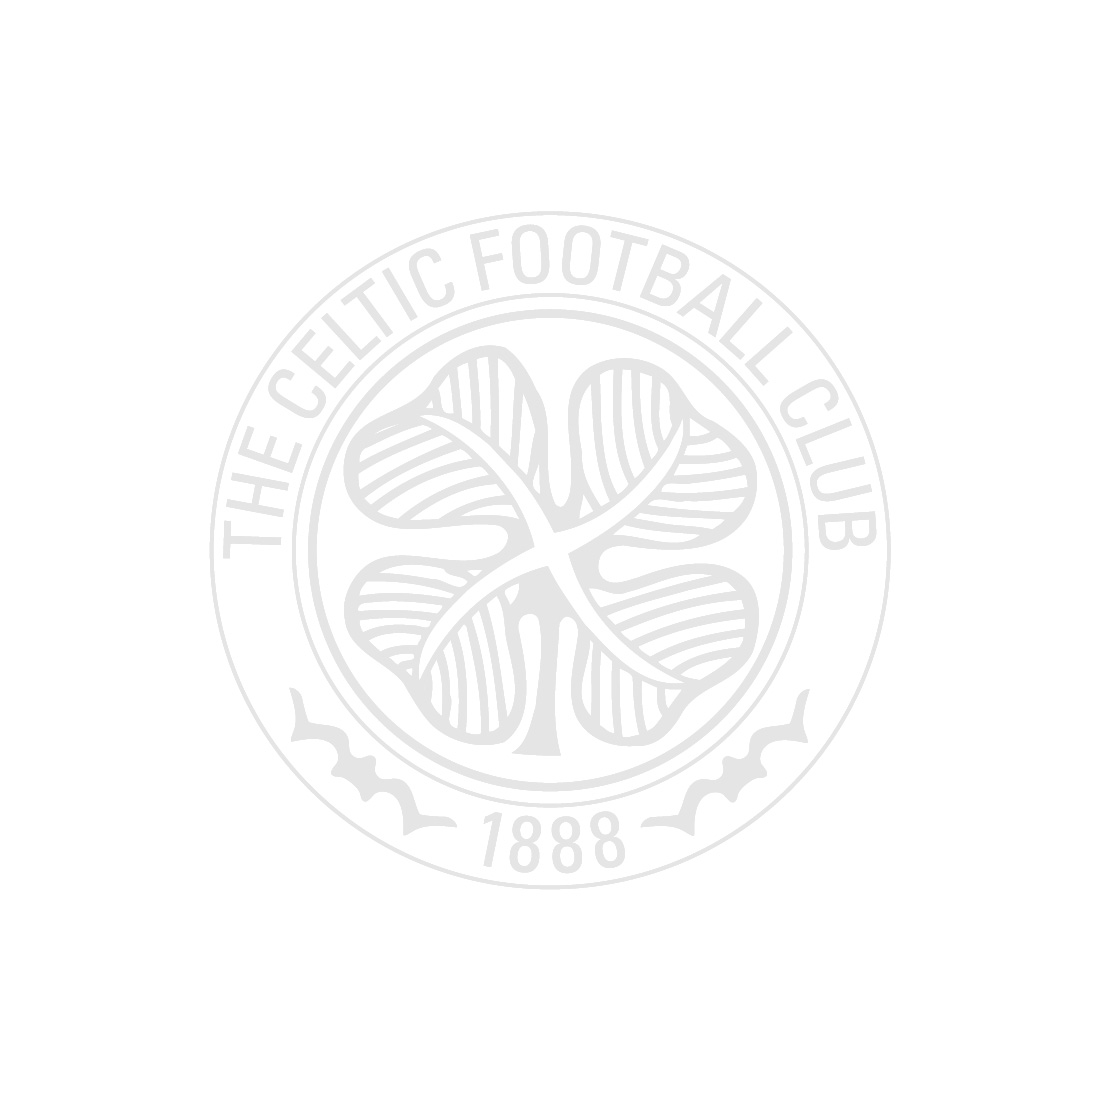 Celtic Dual Mixed Bhoys Mints